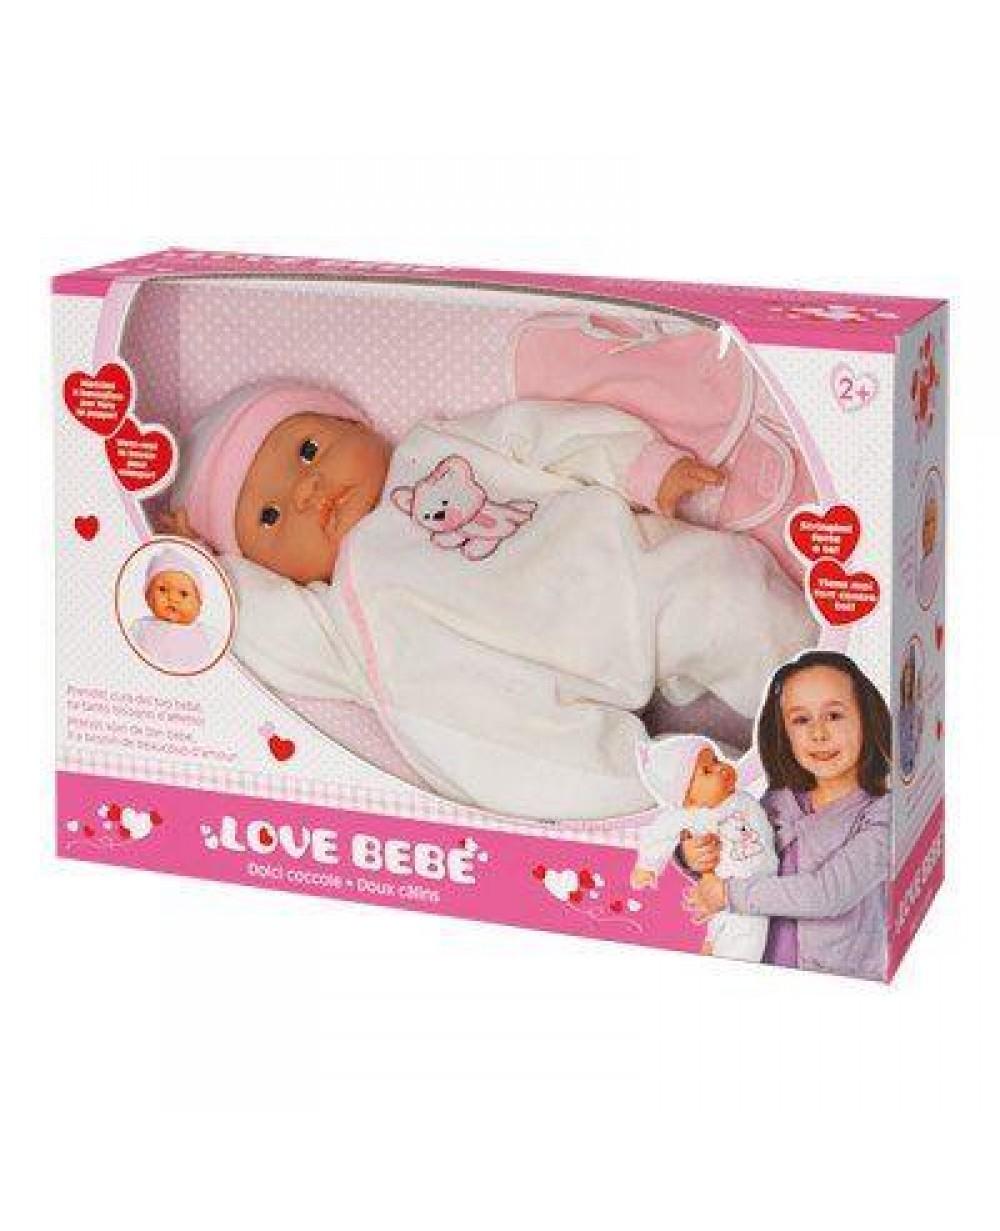 Love bebe bambola 46cm dolci coccole